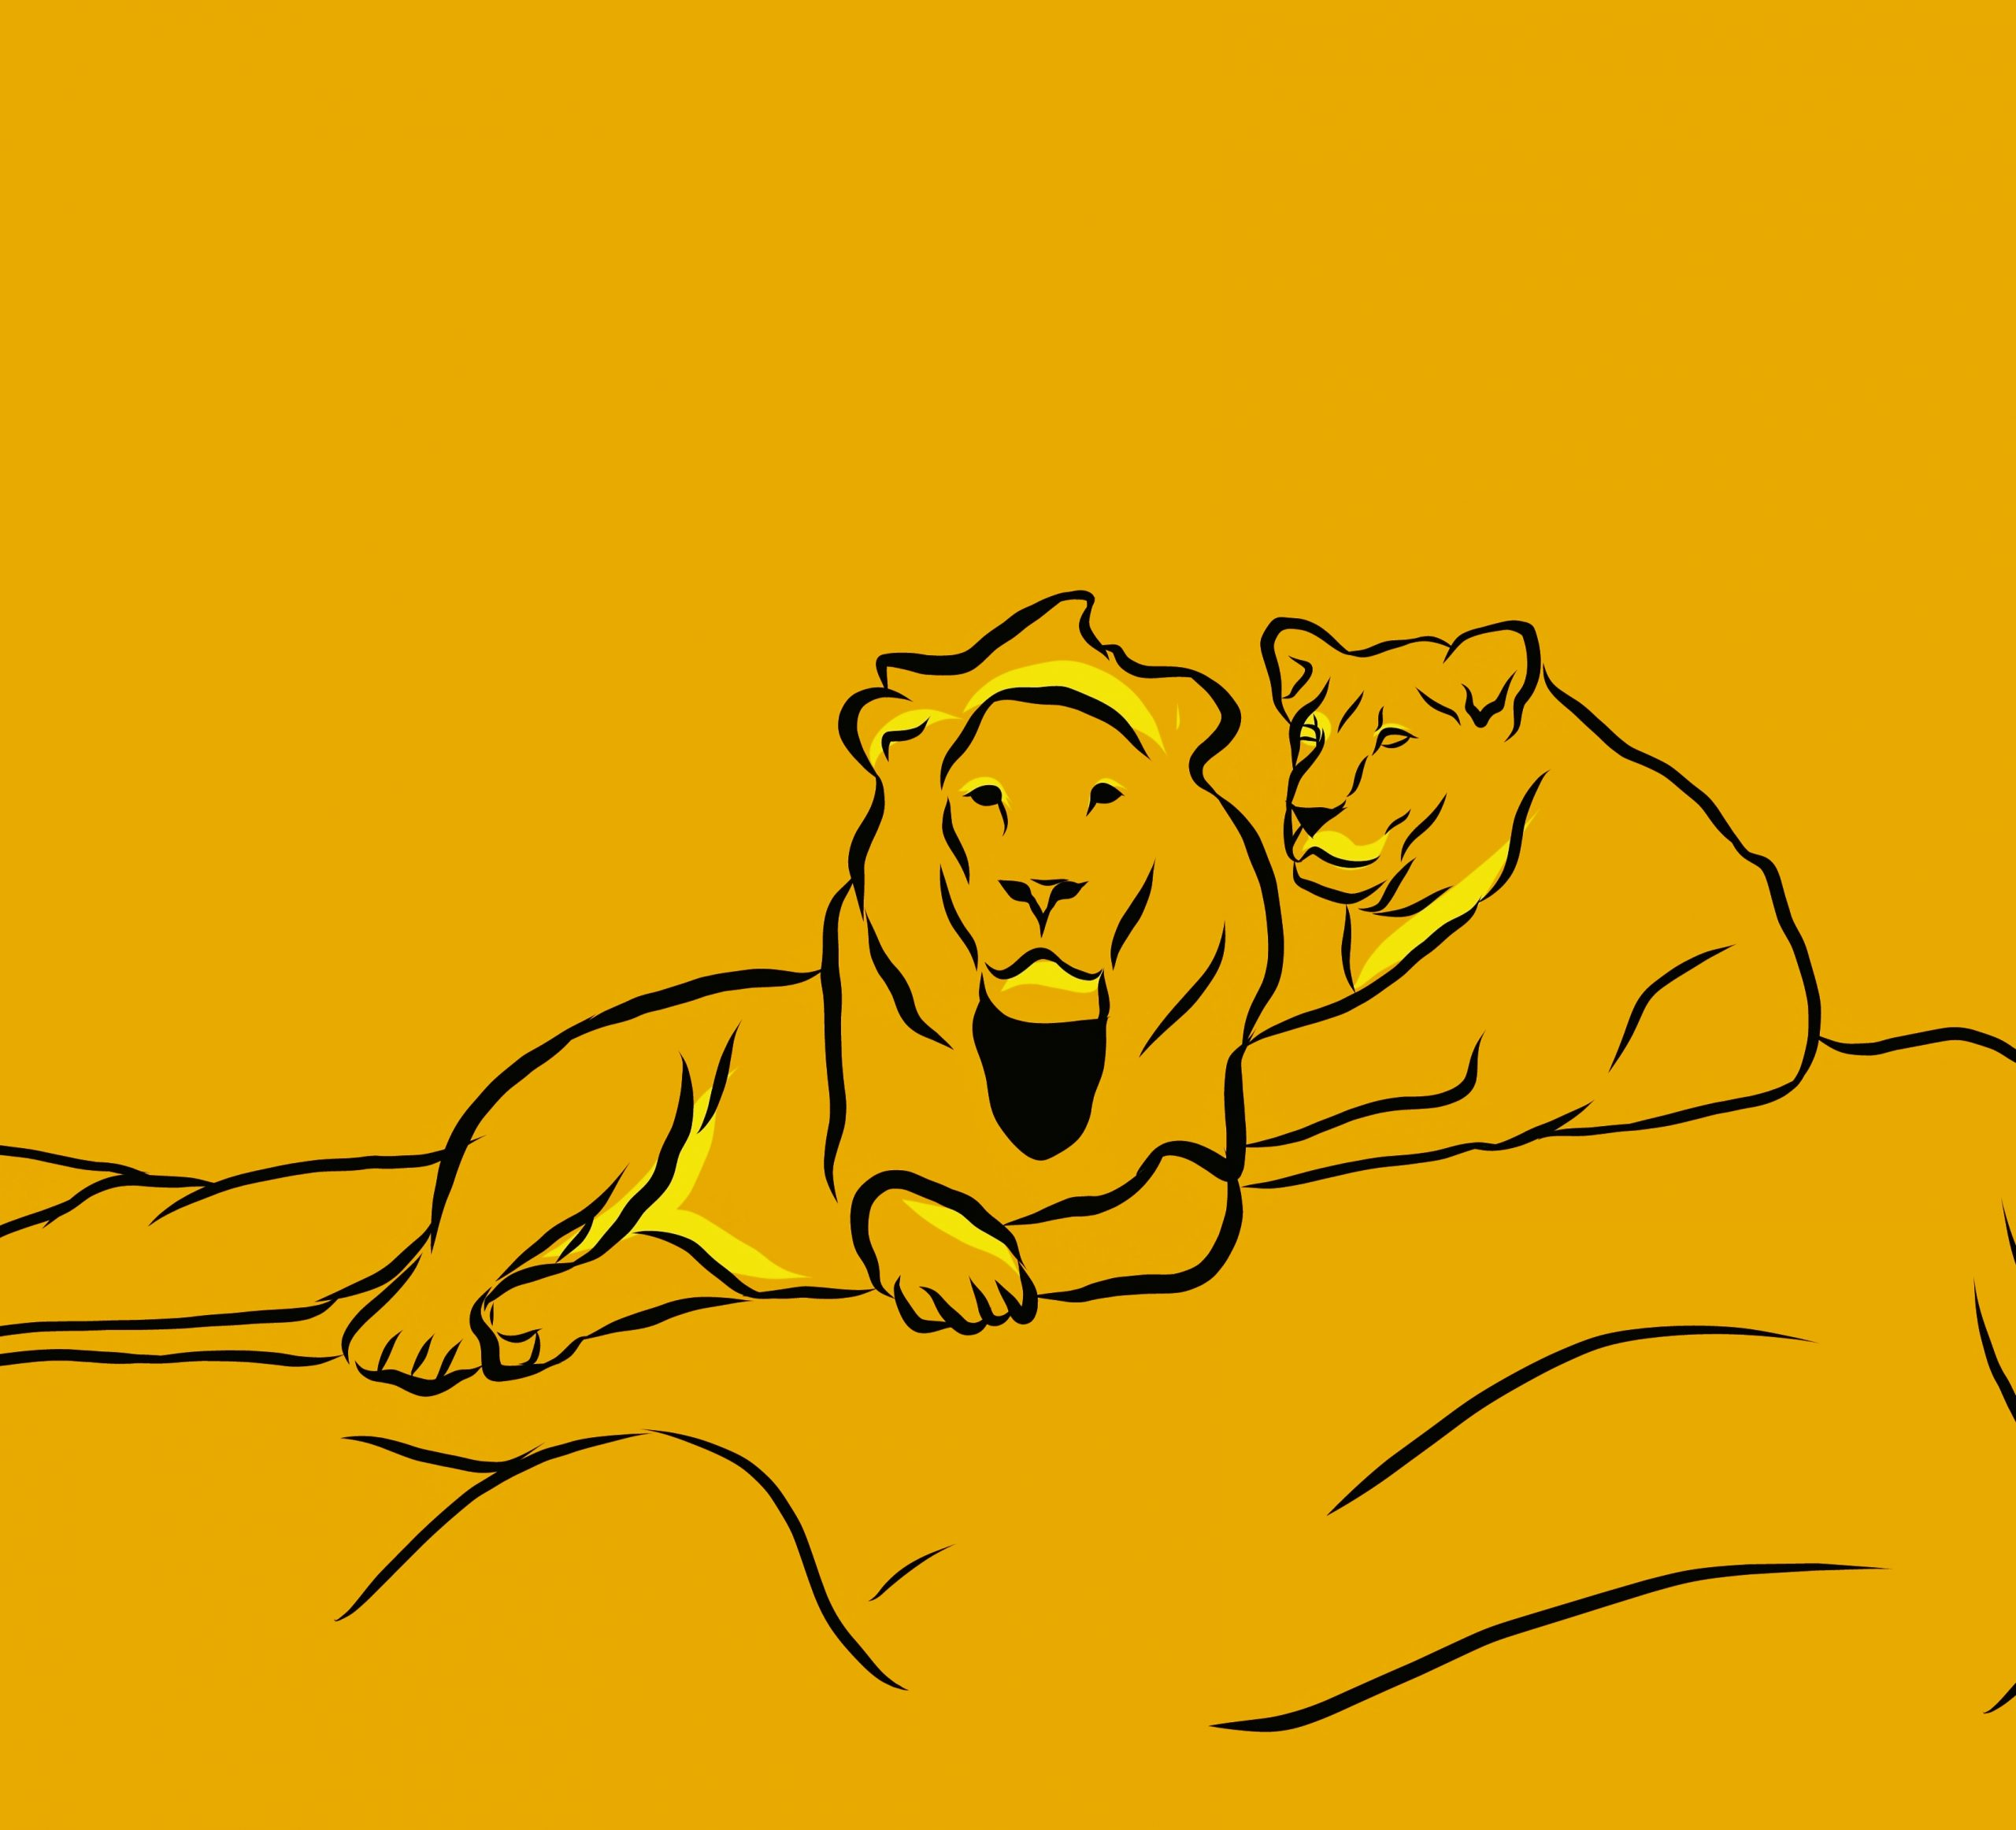 Lions illustration